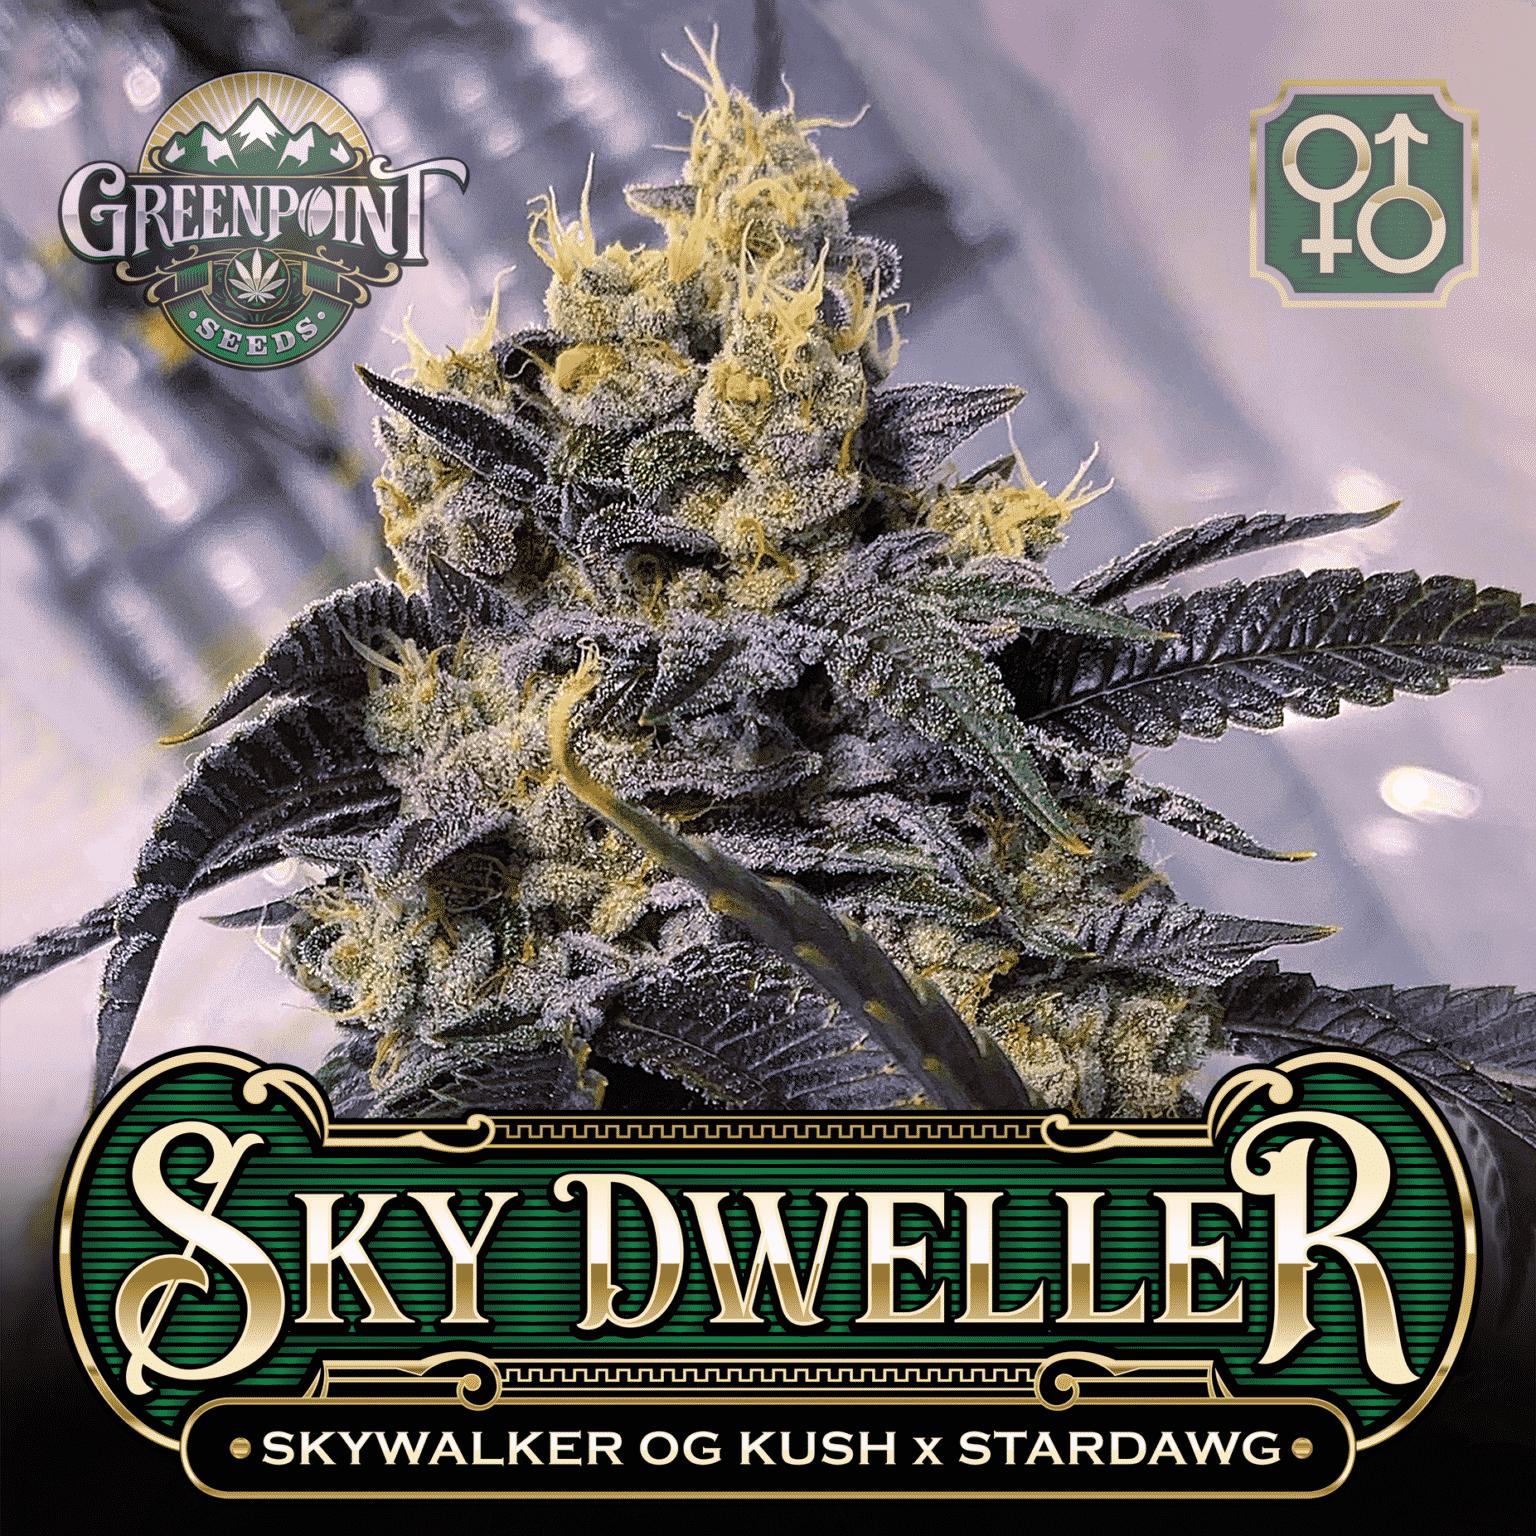 Tahoe Alien #5 x Stardawg Seeds | Sky Warden Cannabis Seeds - USA